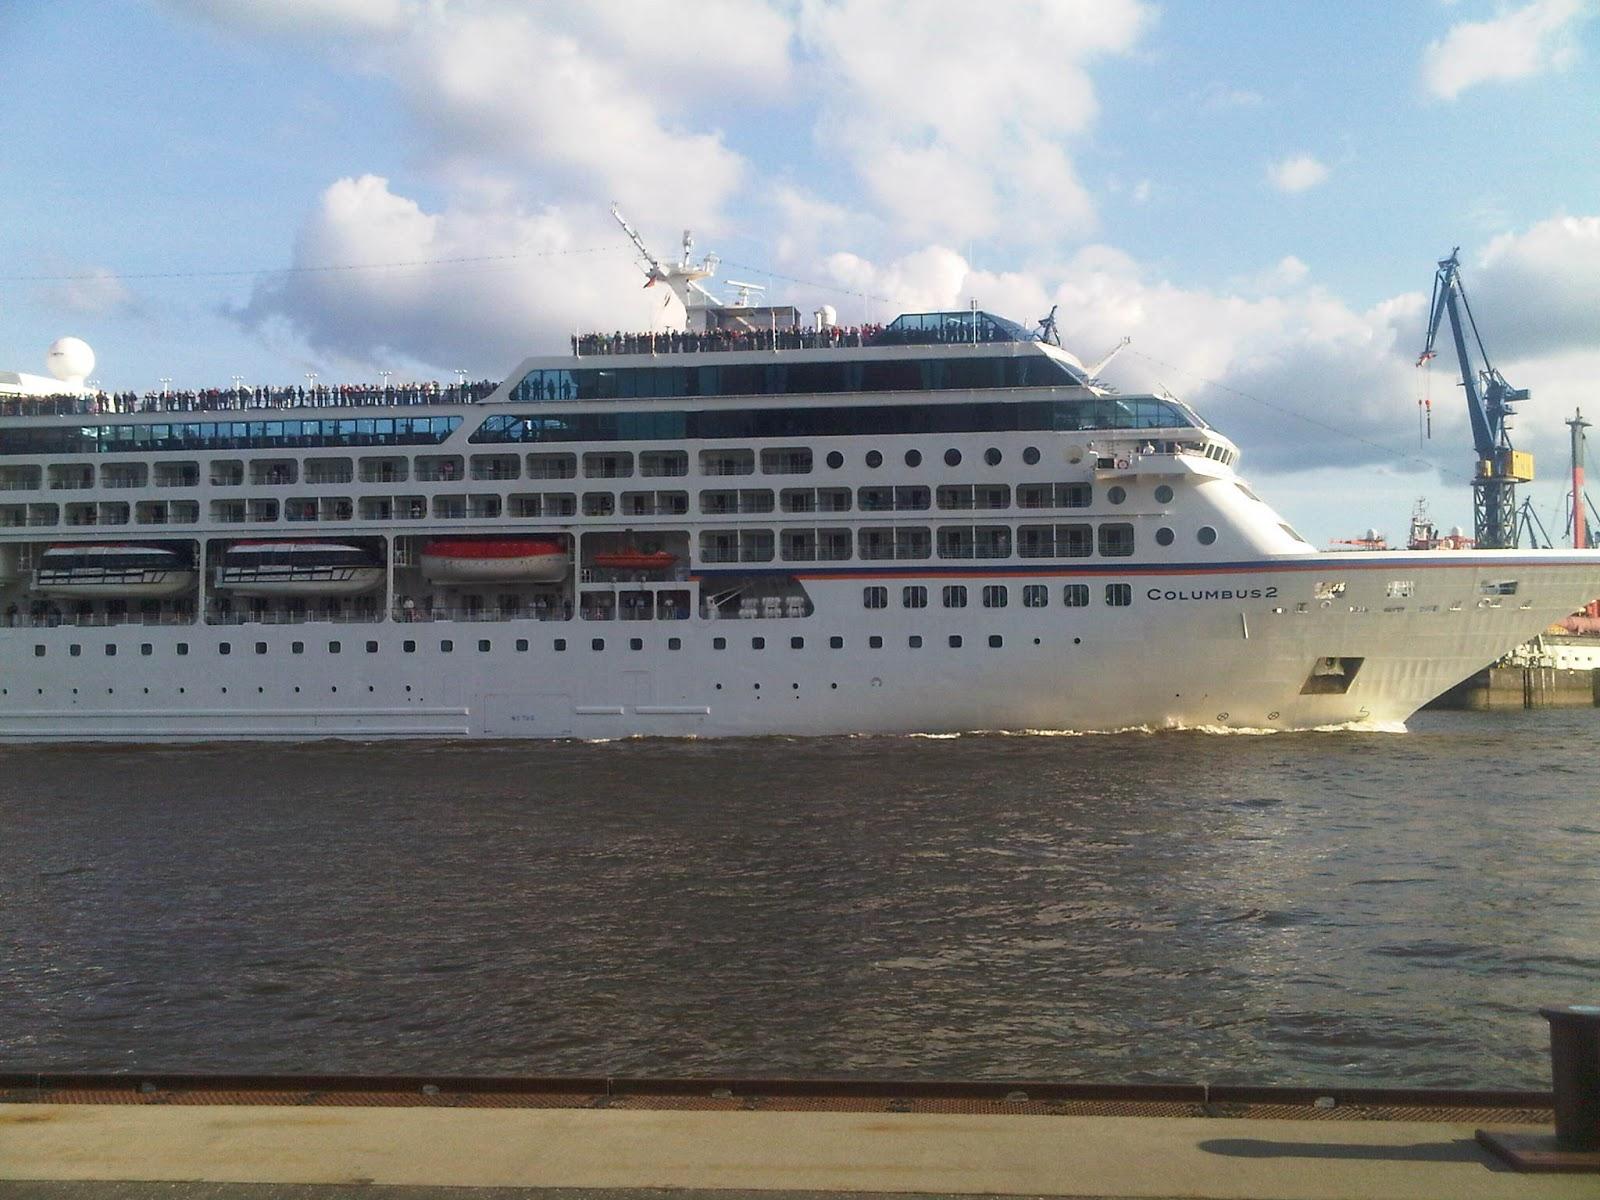 Columbus 2 verlässt den Hamburger Hafen mit vielen Menschen an Oberdeck.